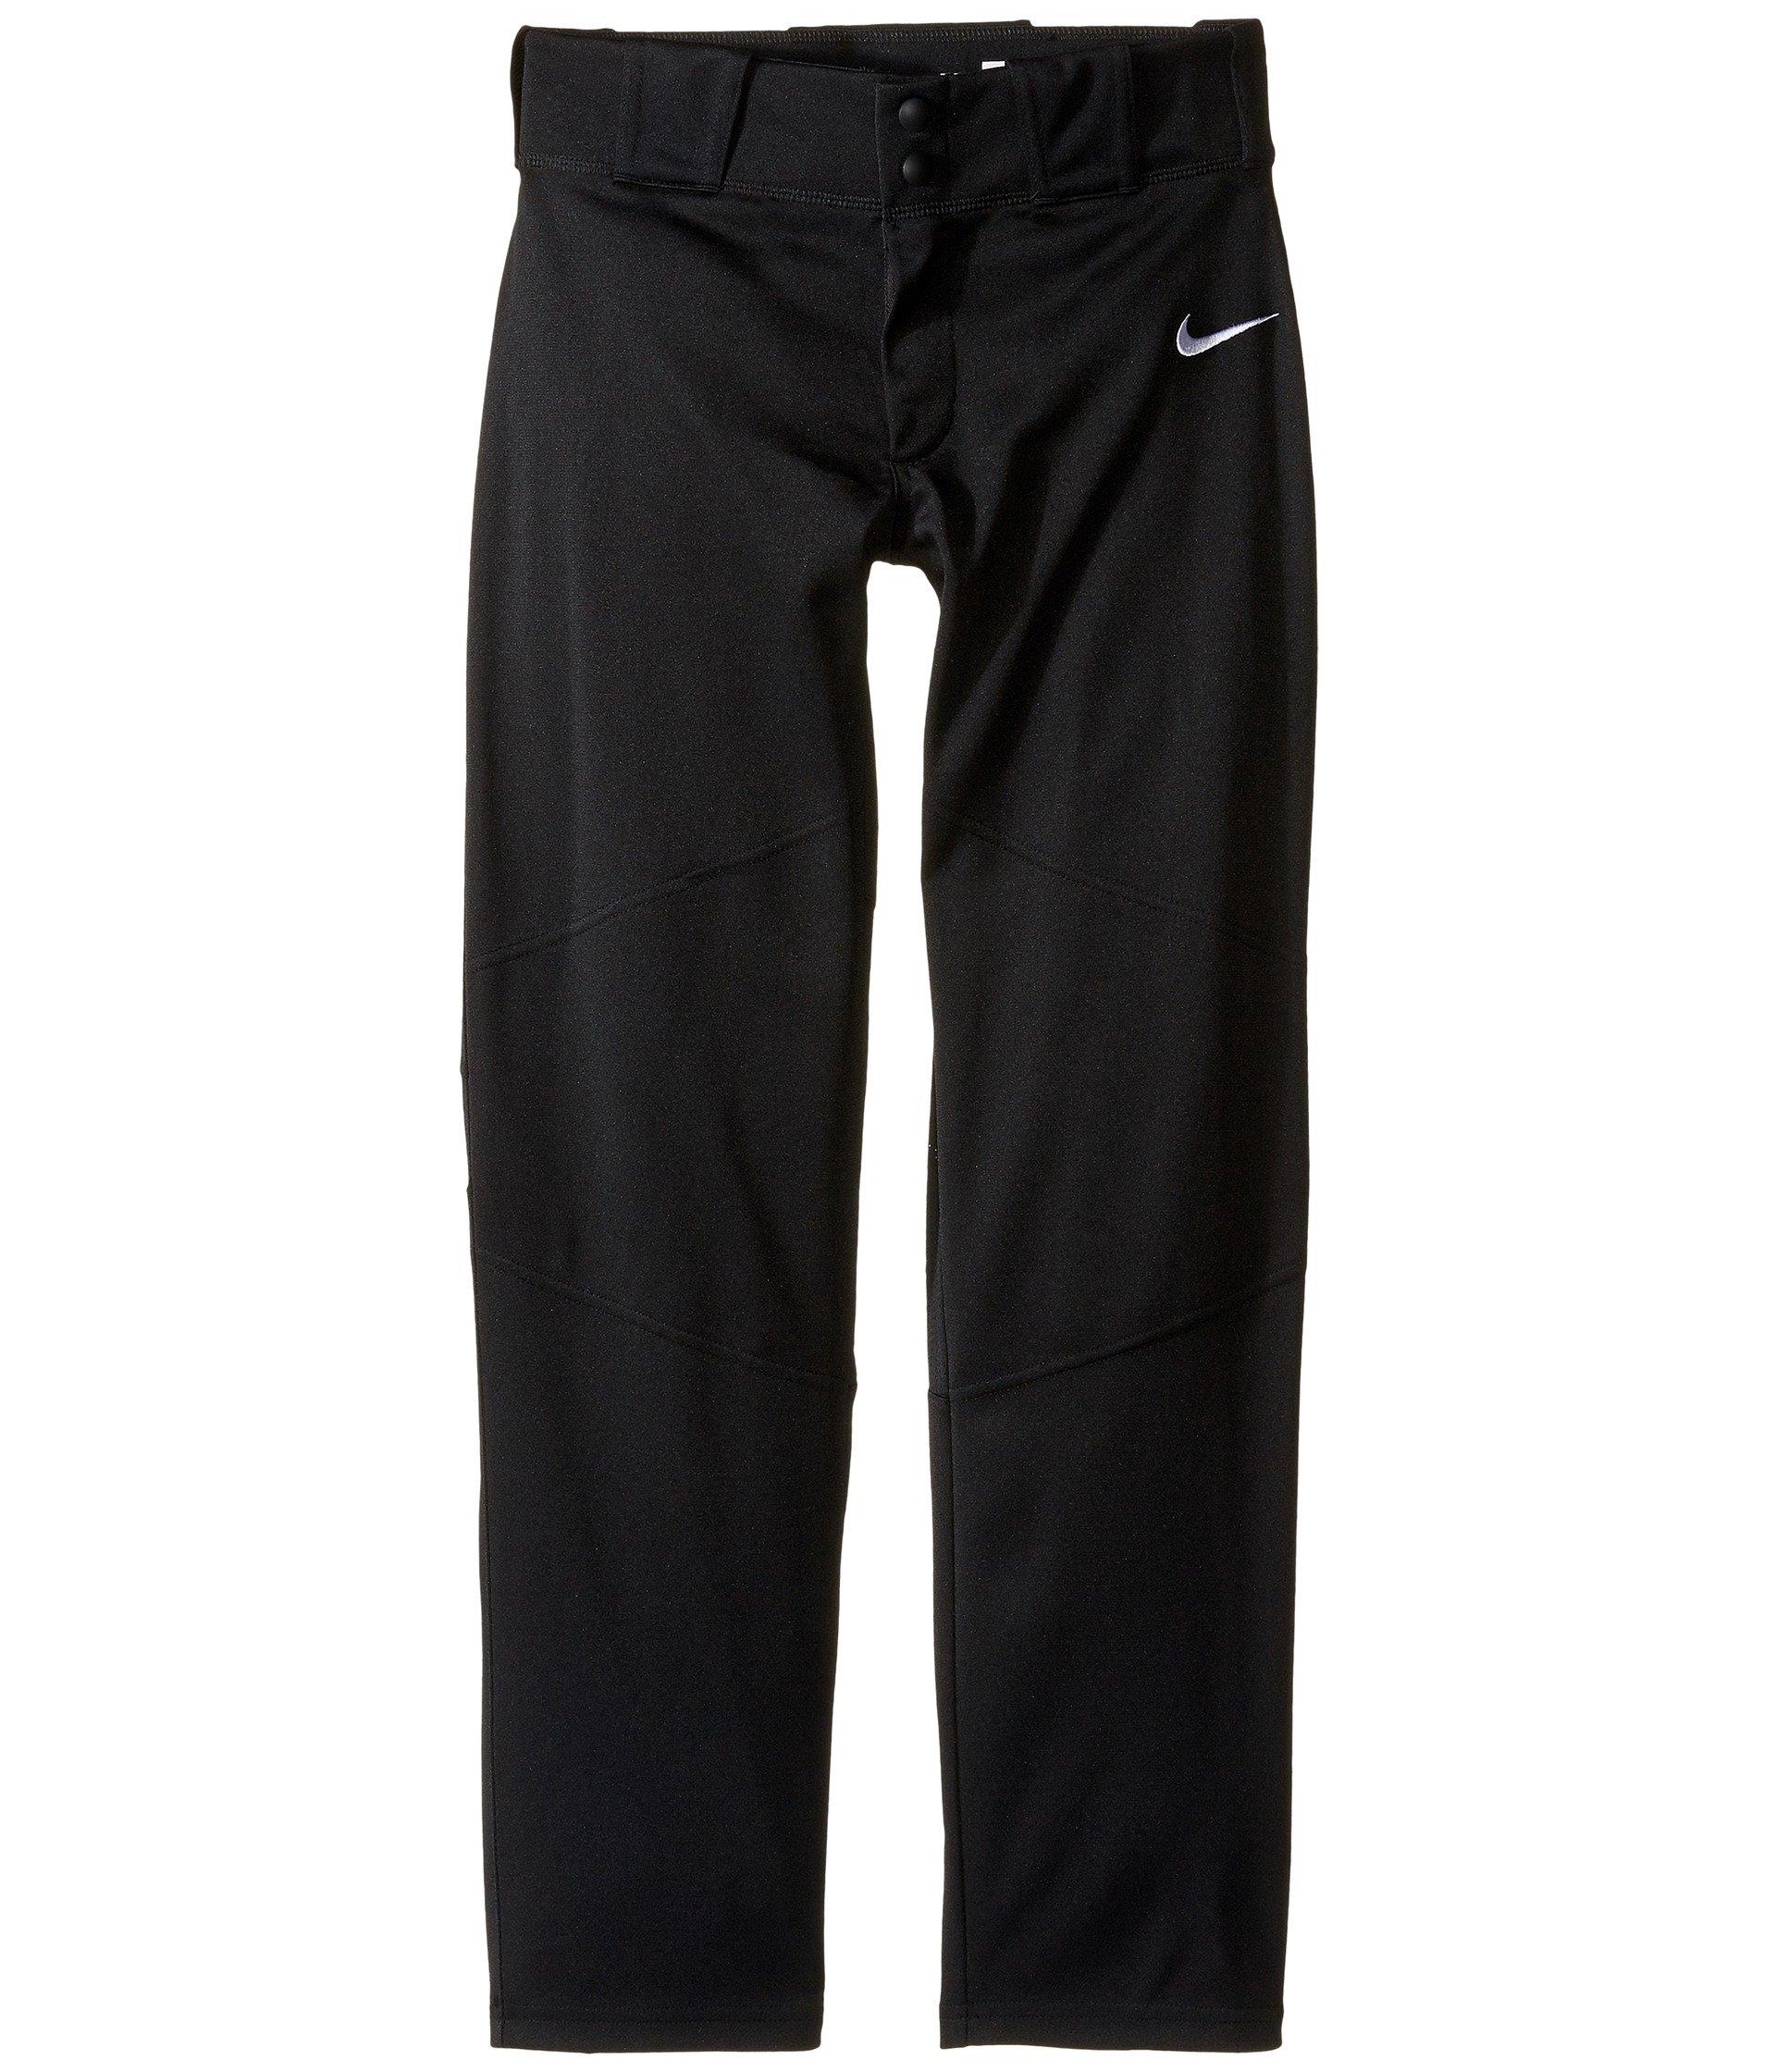 Nike Boys' Pro Vapor Baseball Pants Youth(Black/Small) by Nike